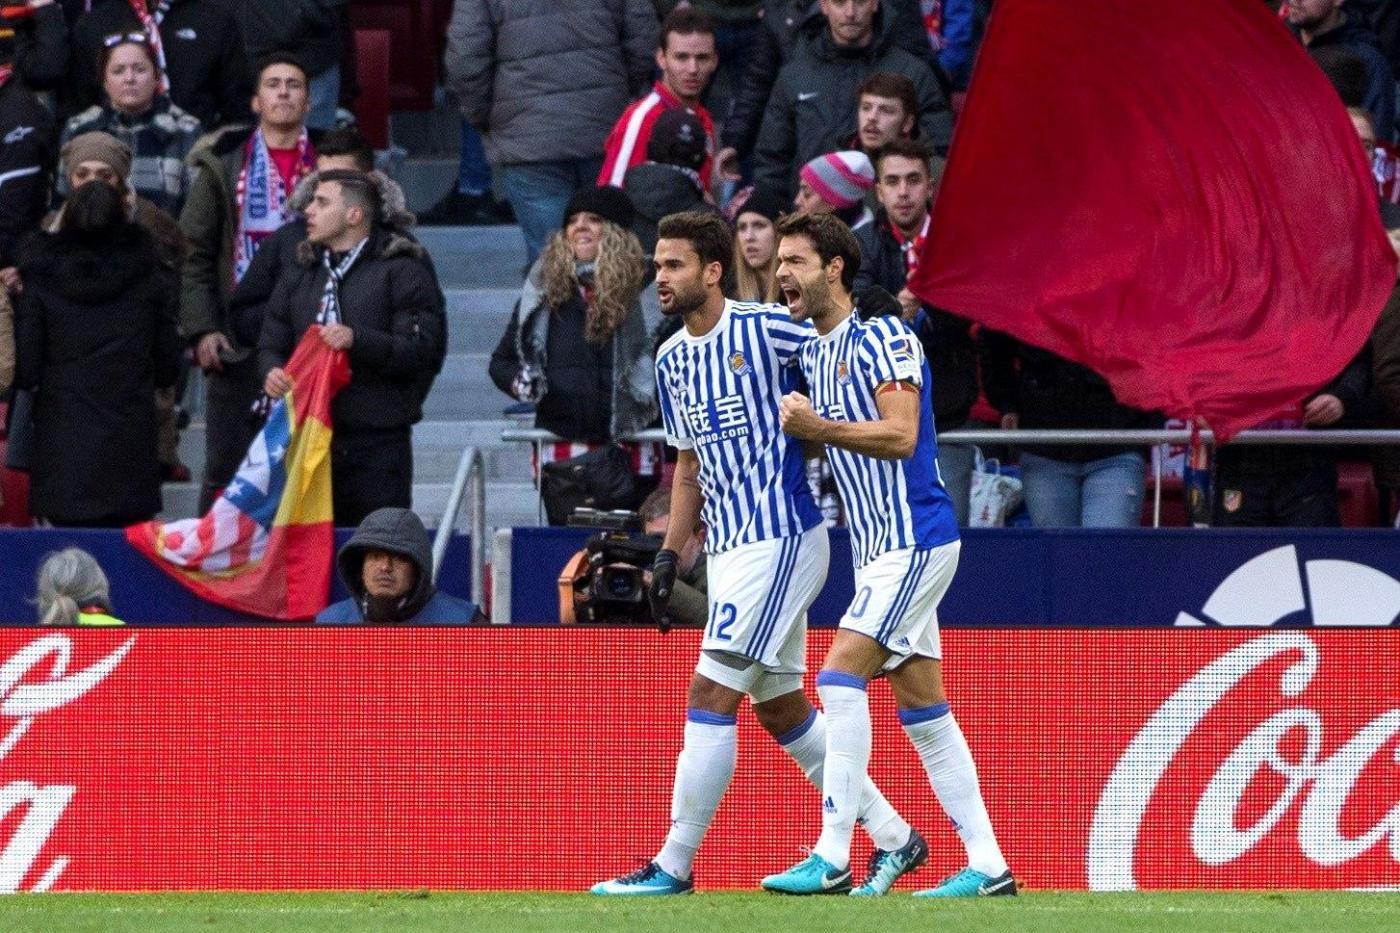 Las Palmas-Real Sociedad sabato 14 aprile, analisi e pronostico LaLiga